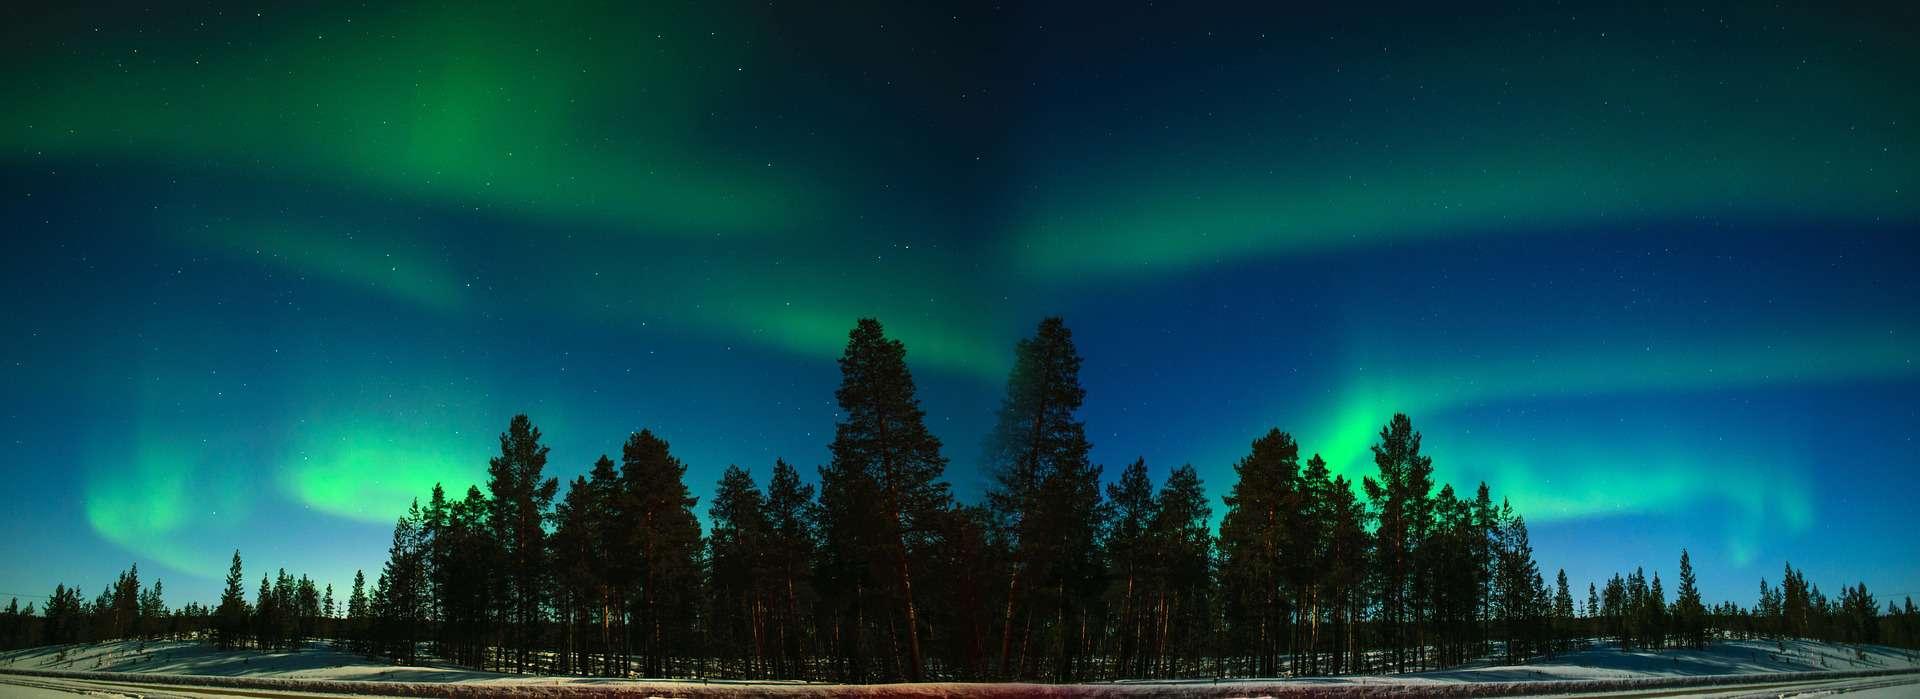 Lappland Snowkite-Camp 22.01.-05.02. 2022 20